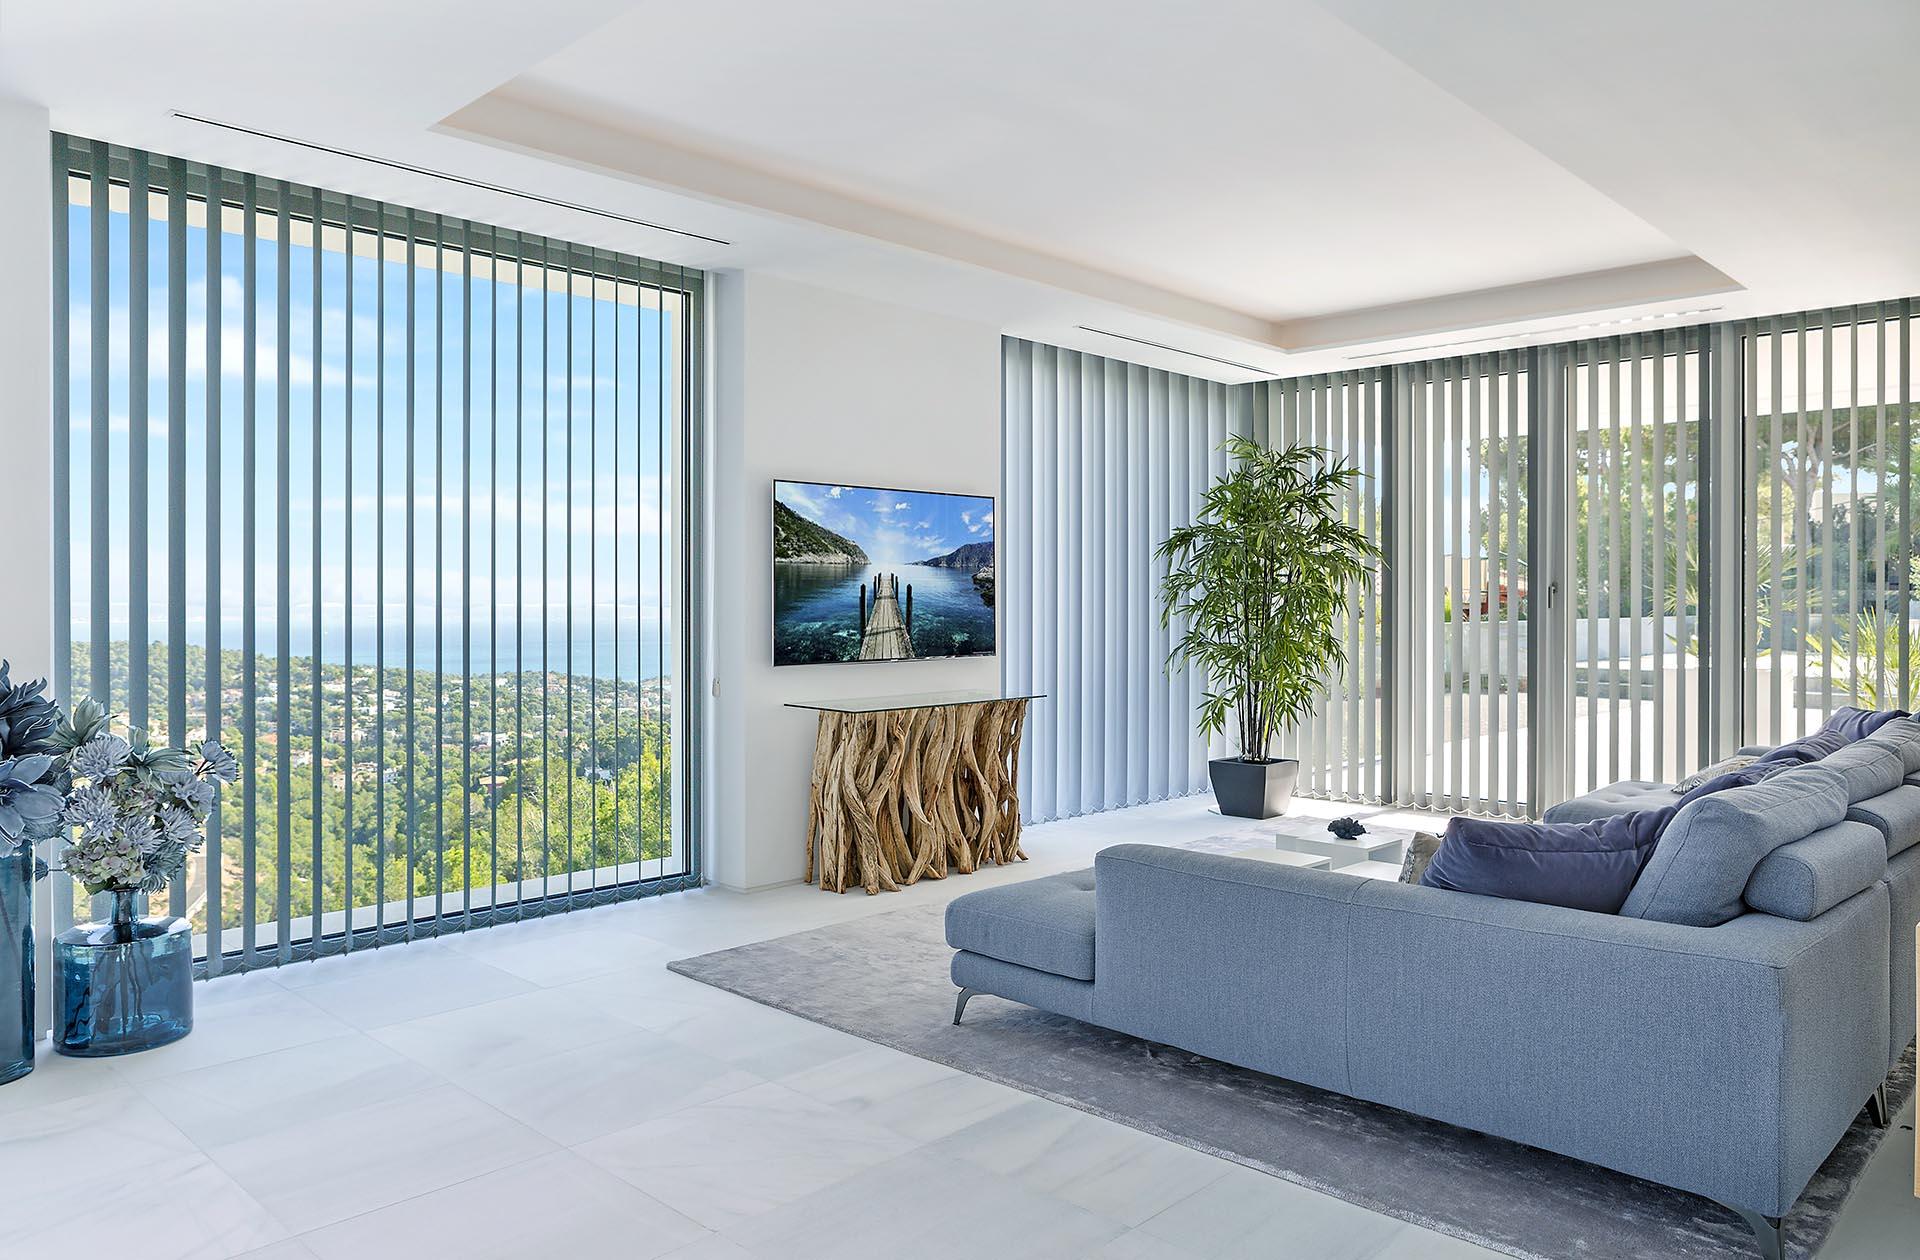 Beautiful modern villa in Costa den Blanes - Beautiful view